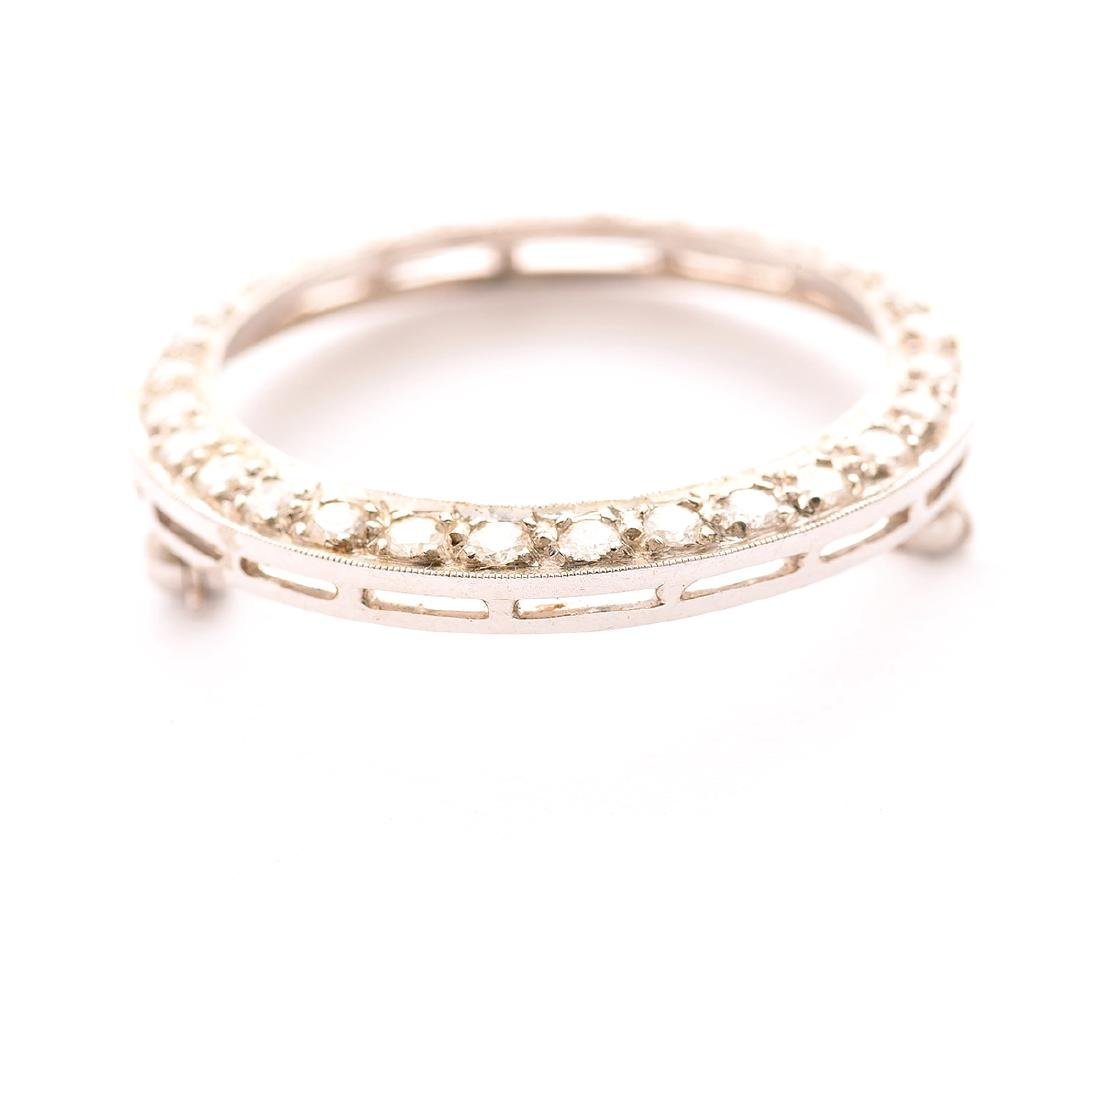 Diamond, 14k White Gold Pin - 3